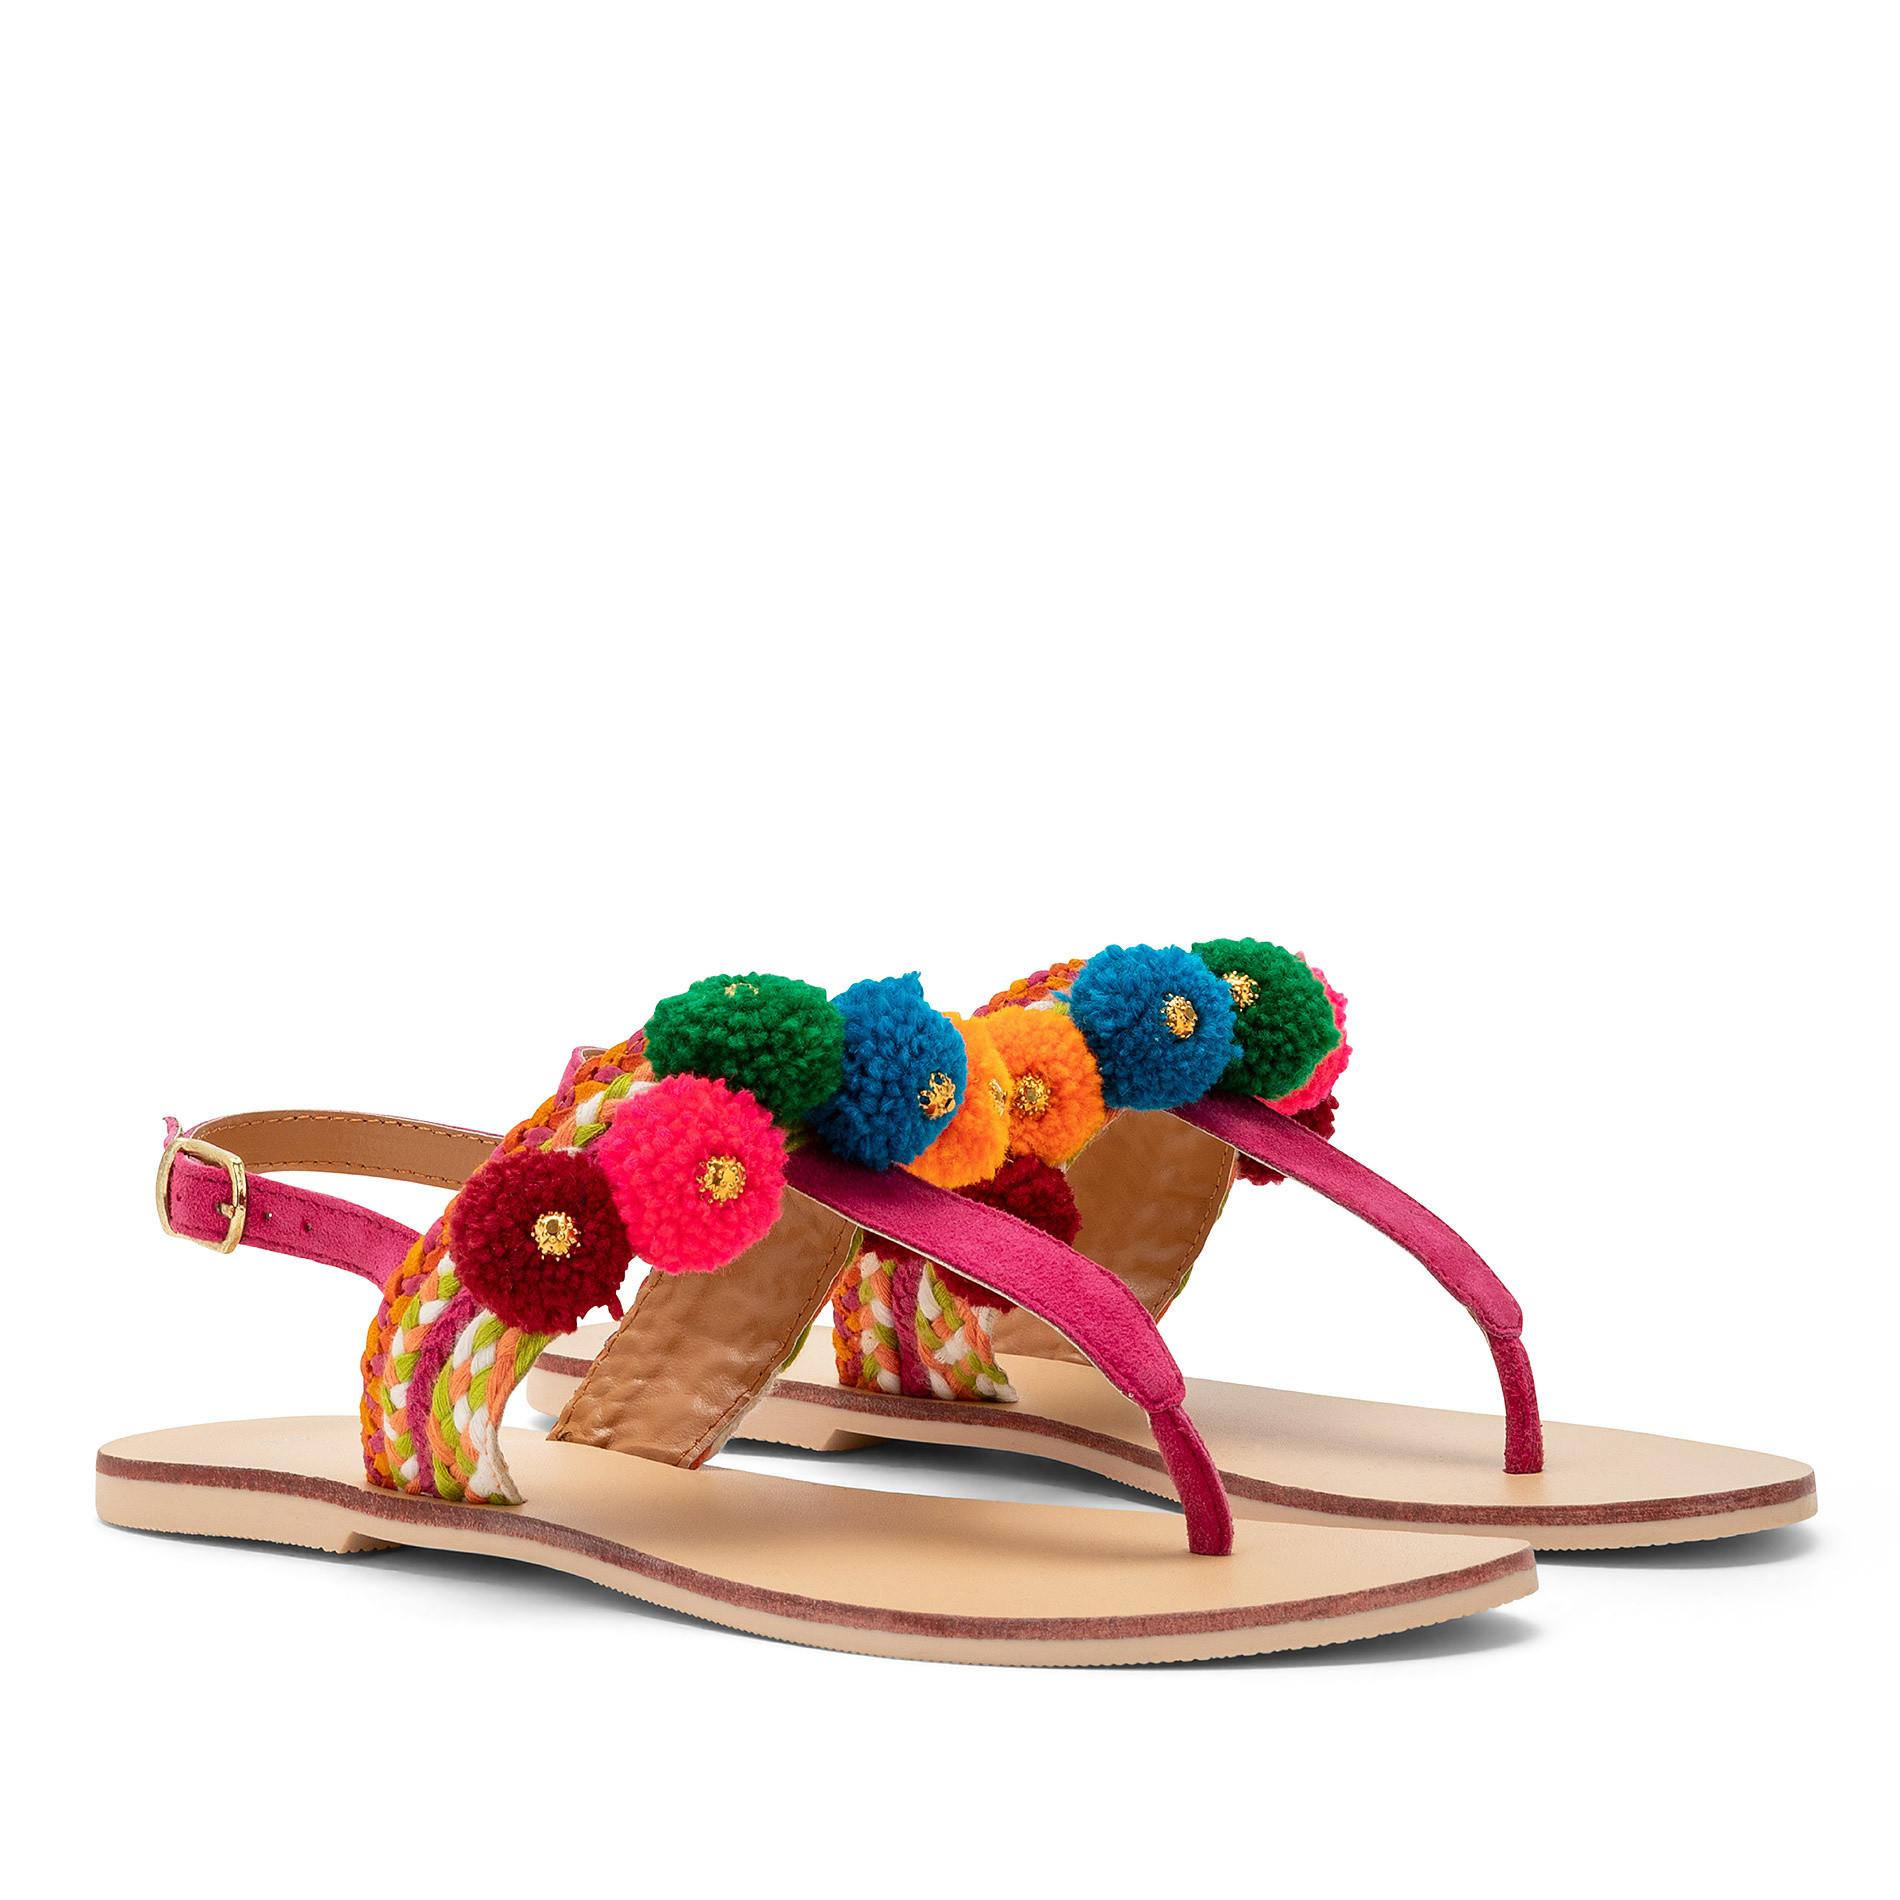 Sandalo infradito con pompon, Multicolor, large image number 0